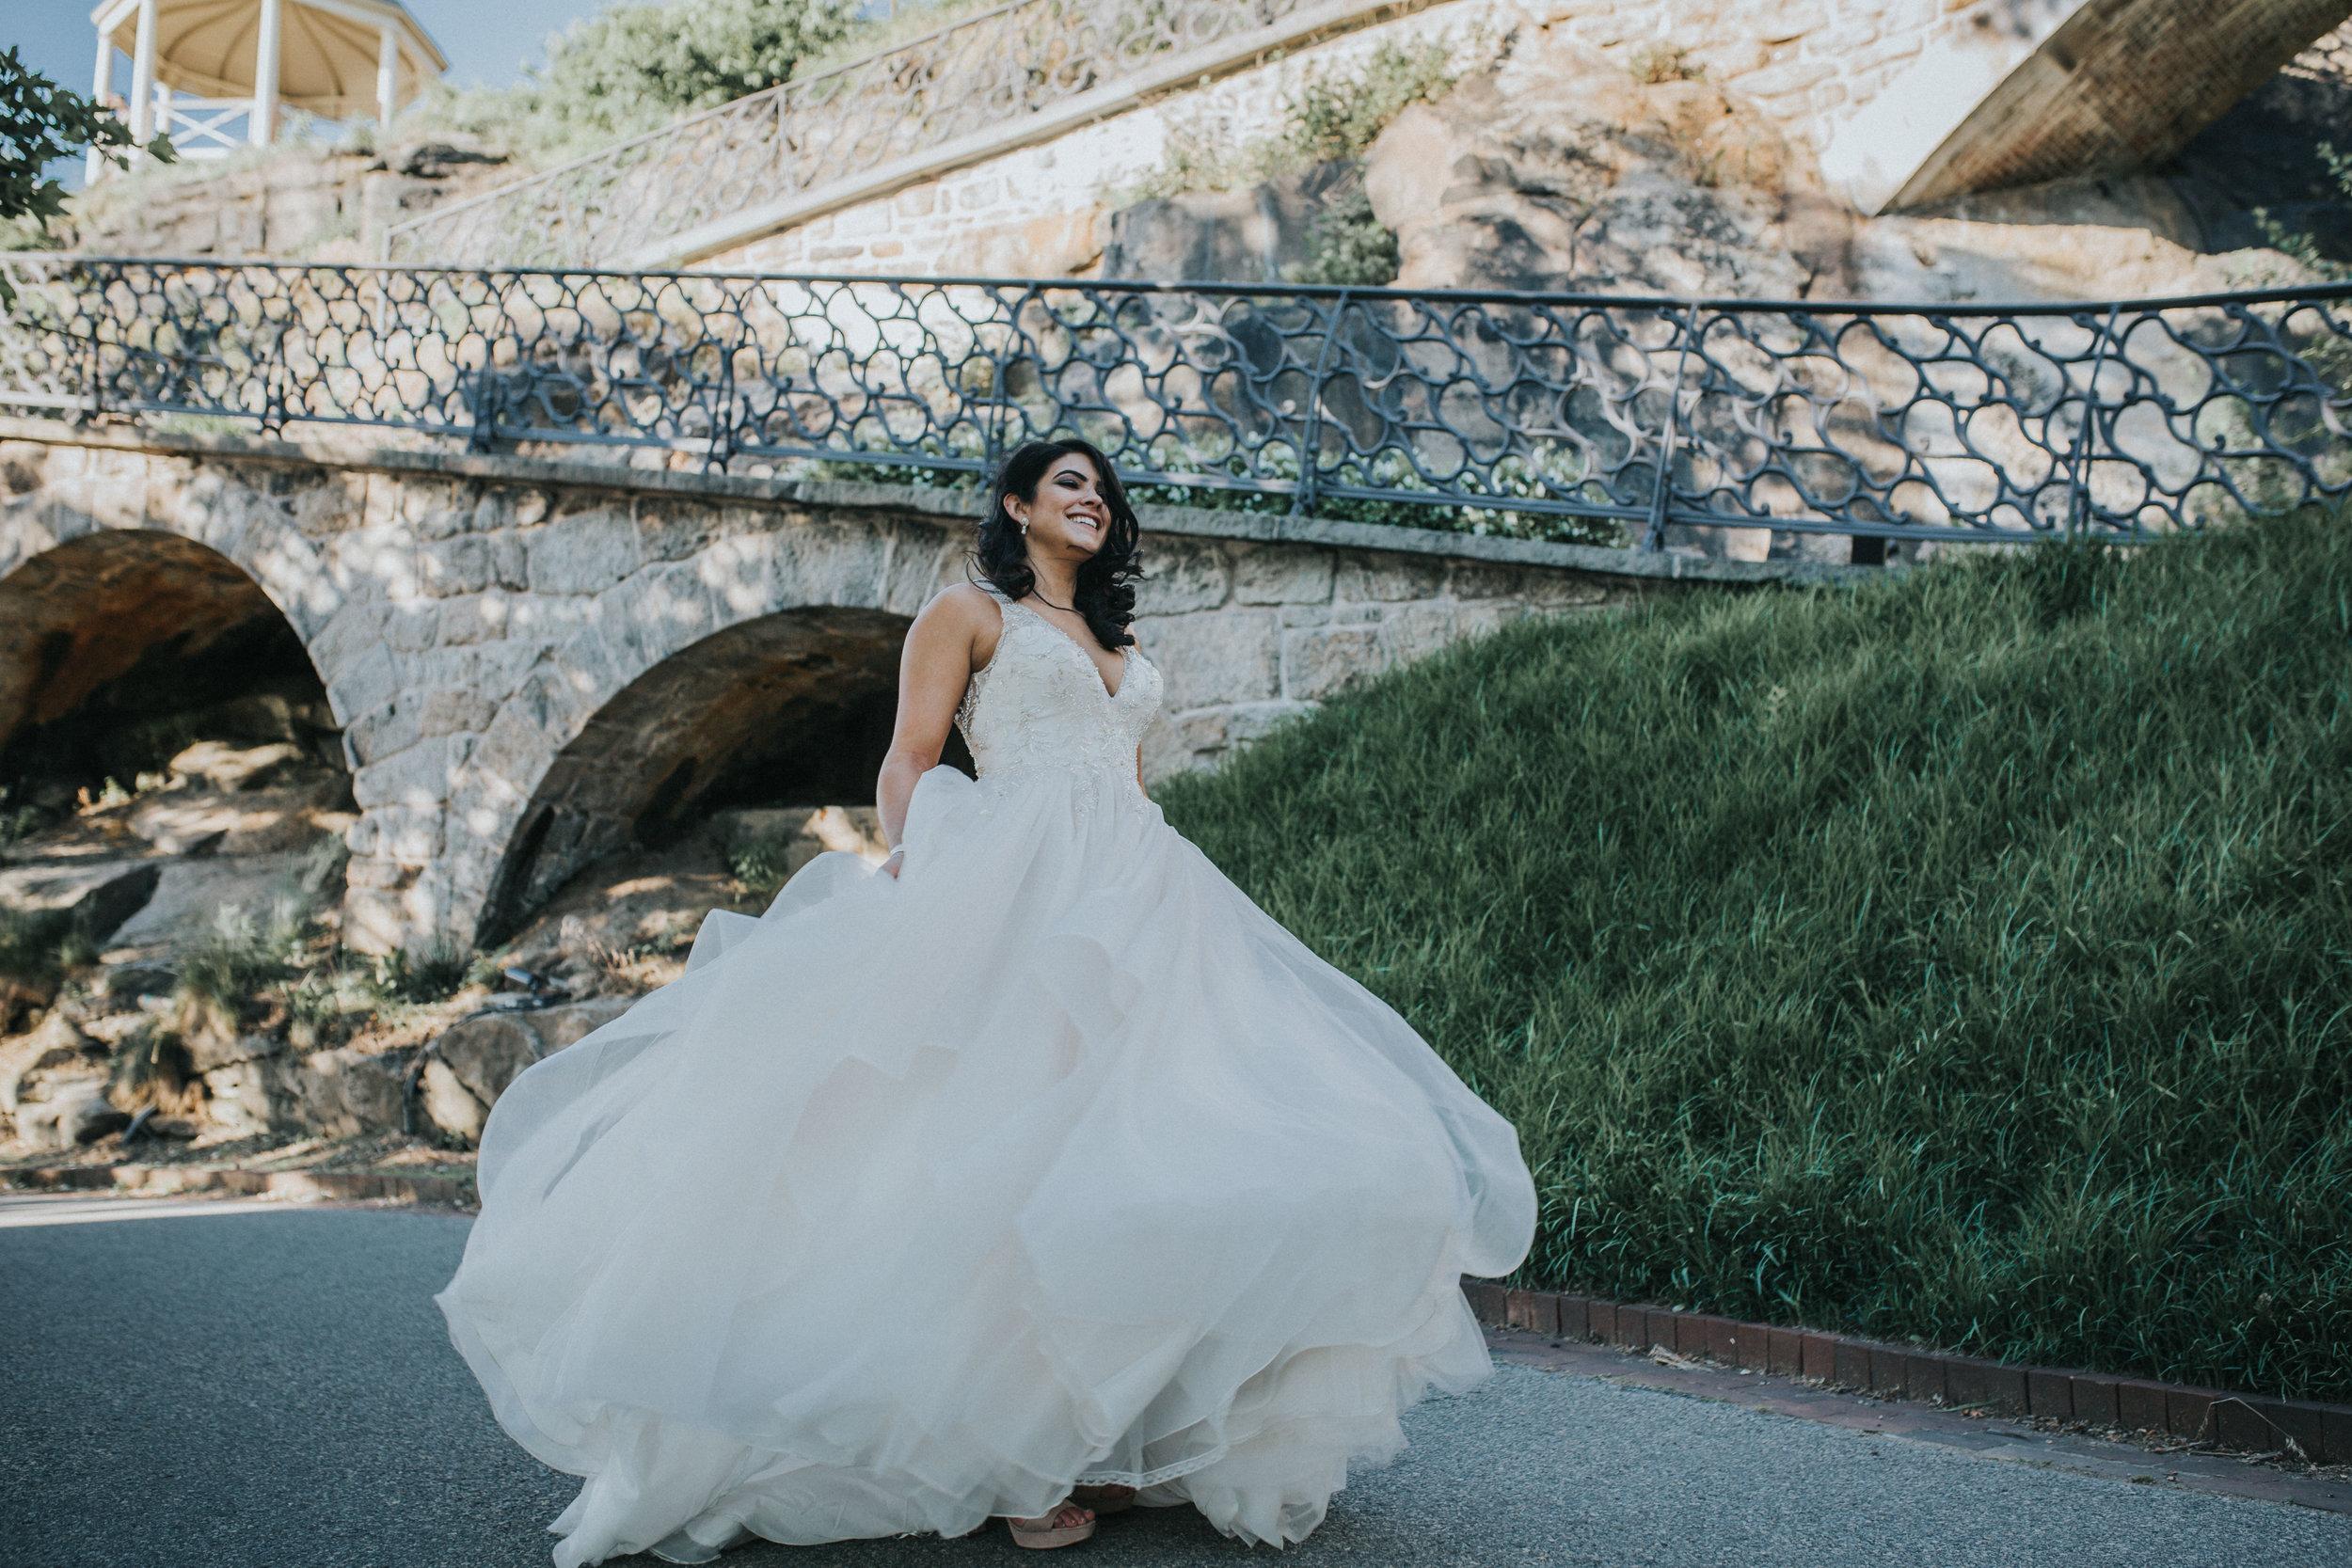 NewJersey_Wedding_Photography_Philadelphia__cescaphe_Waterworks_Bride&Groom-15.jpg